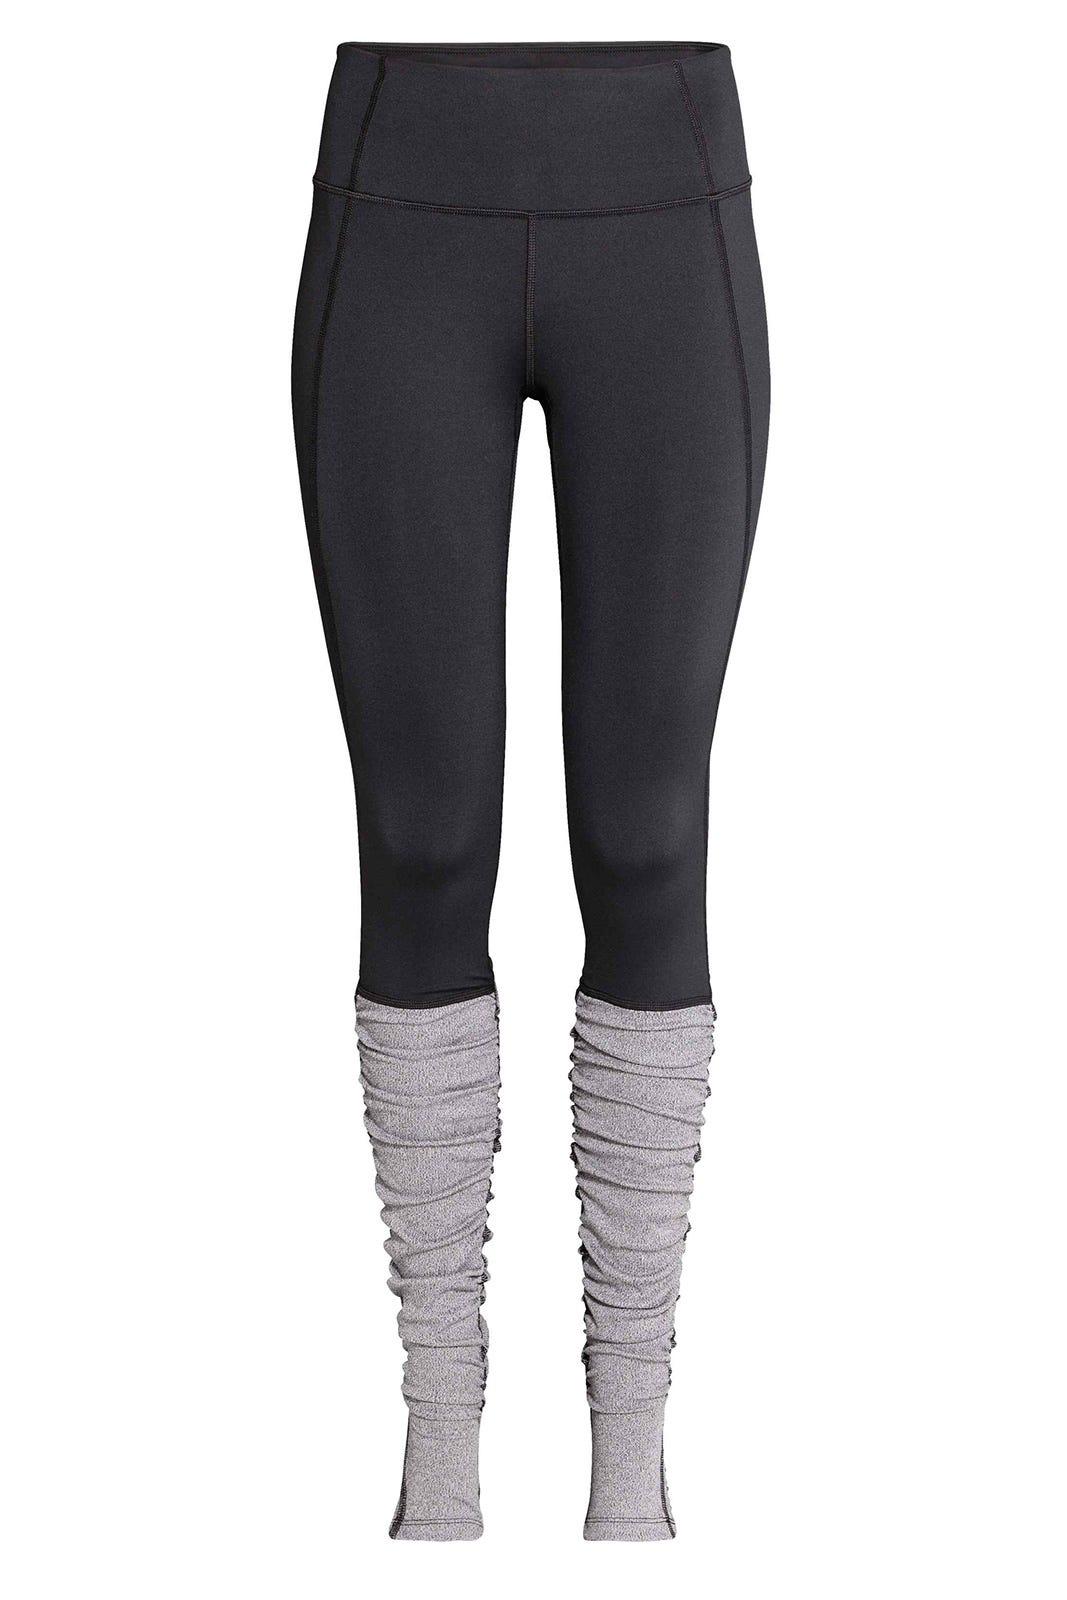 402cc16b7 Best Yoga Pants